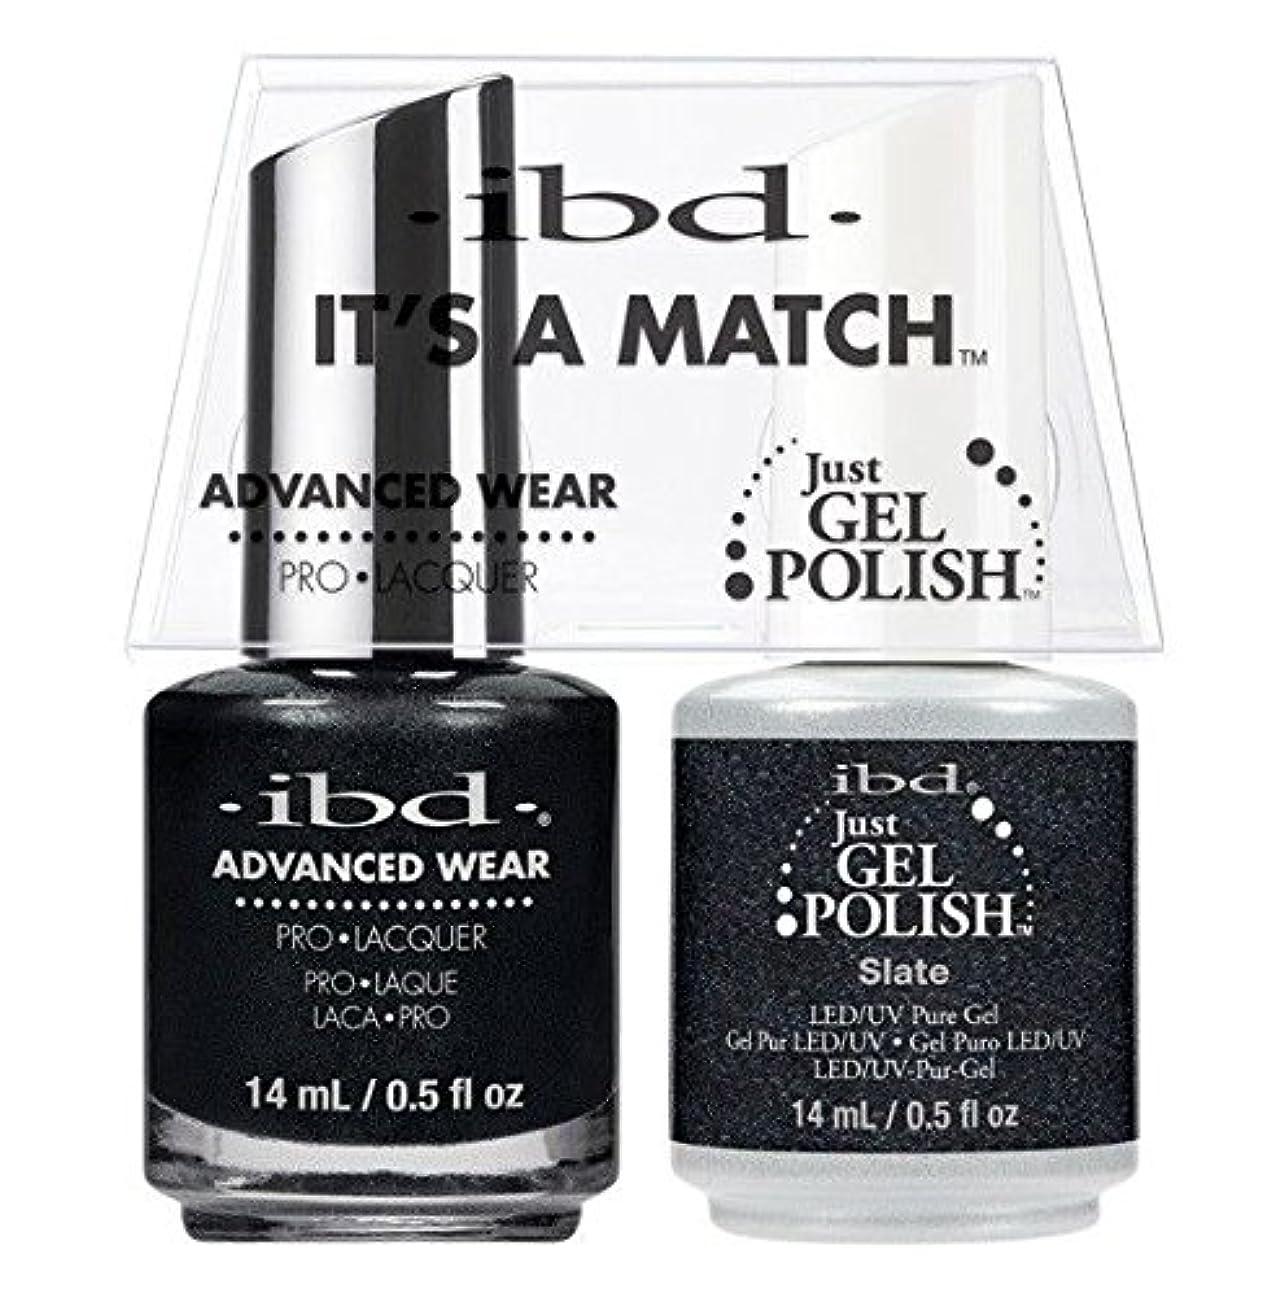 ibd - It's A Match -Duo Pack- Slate - 14 mL / 0.5 oz Each